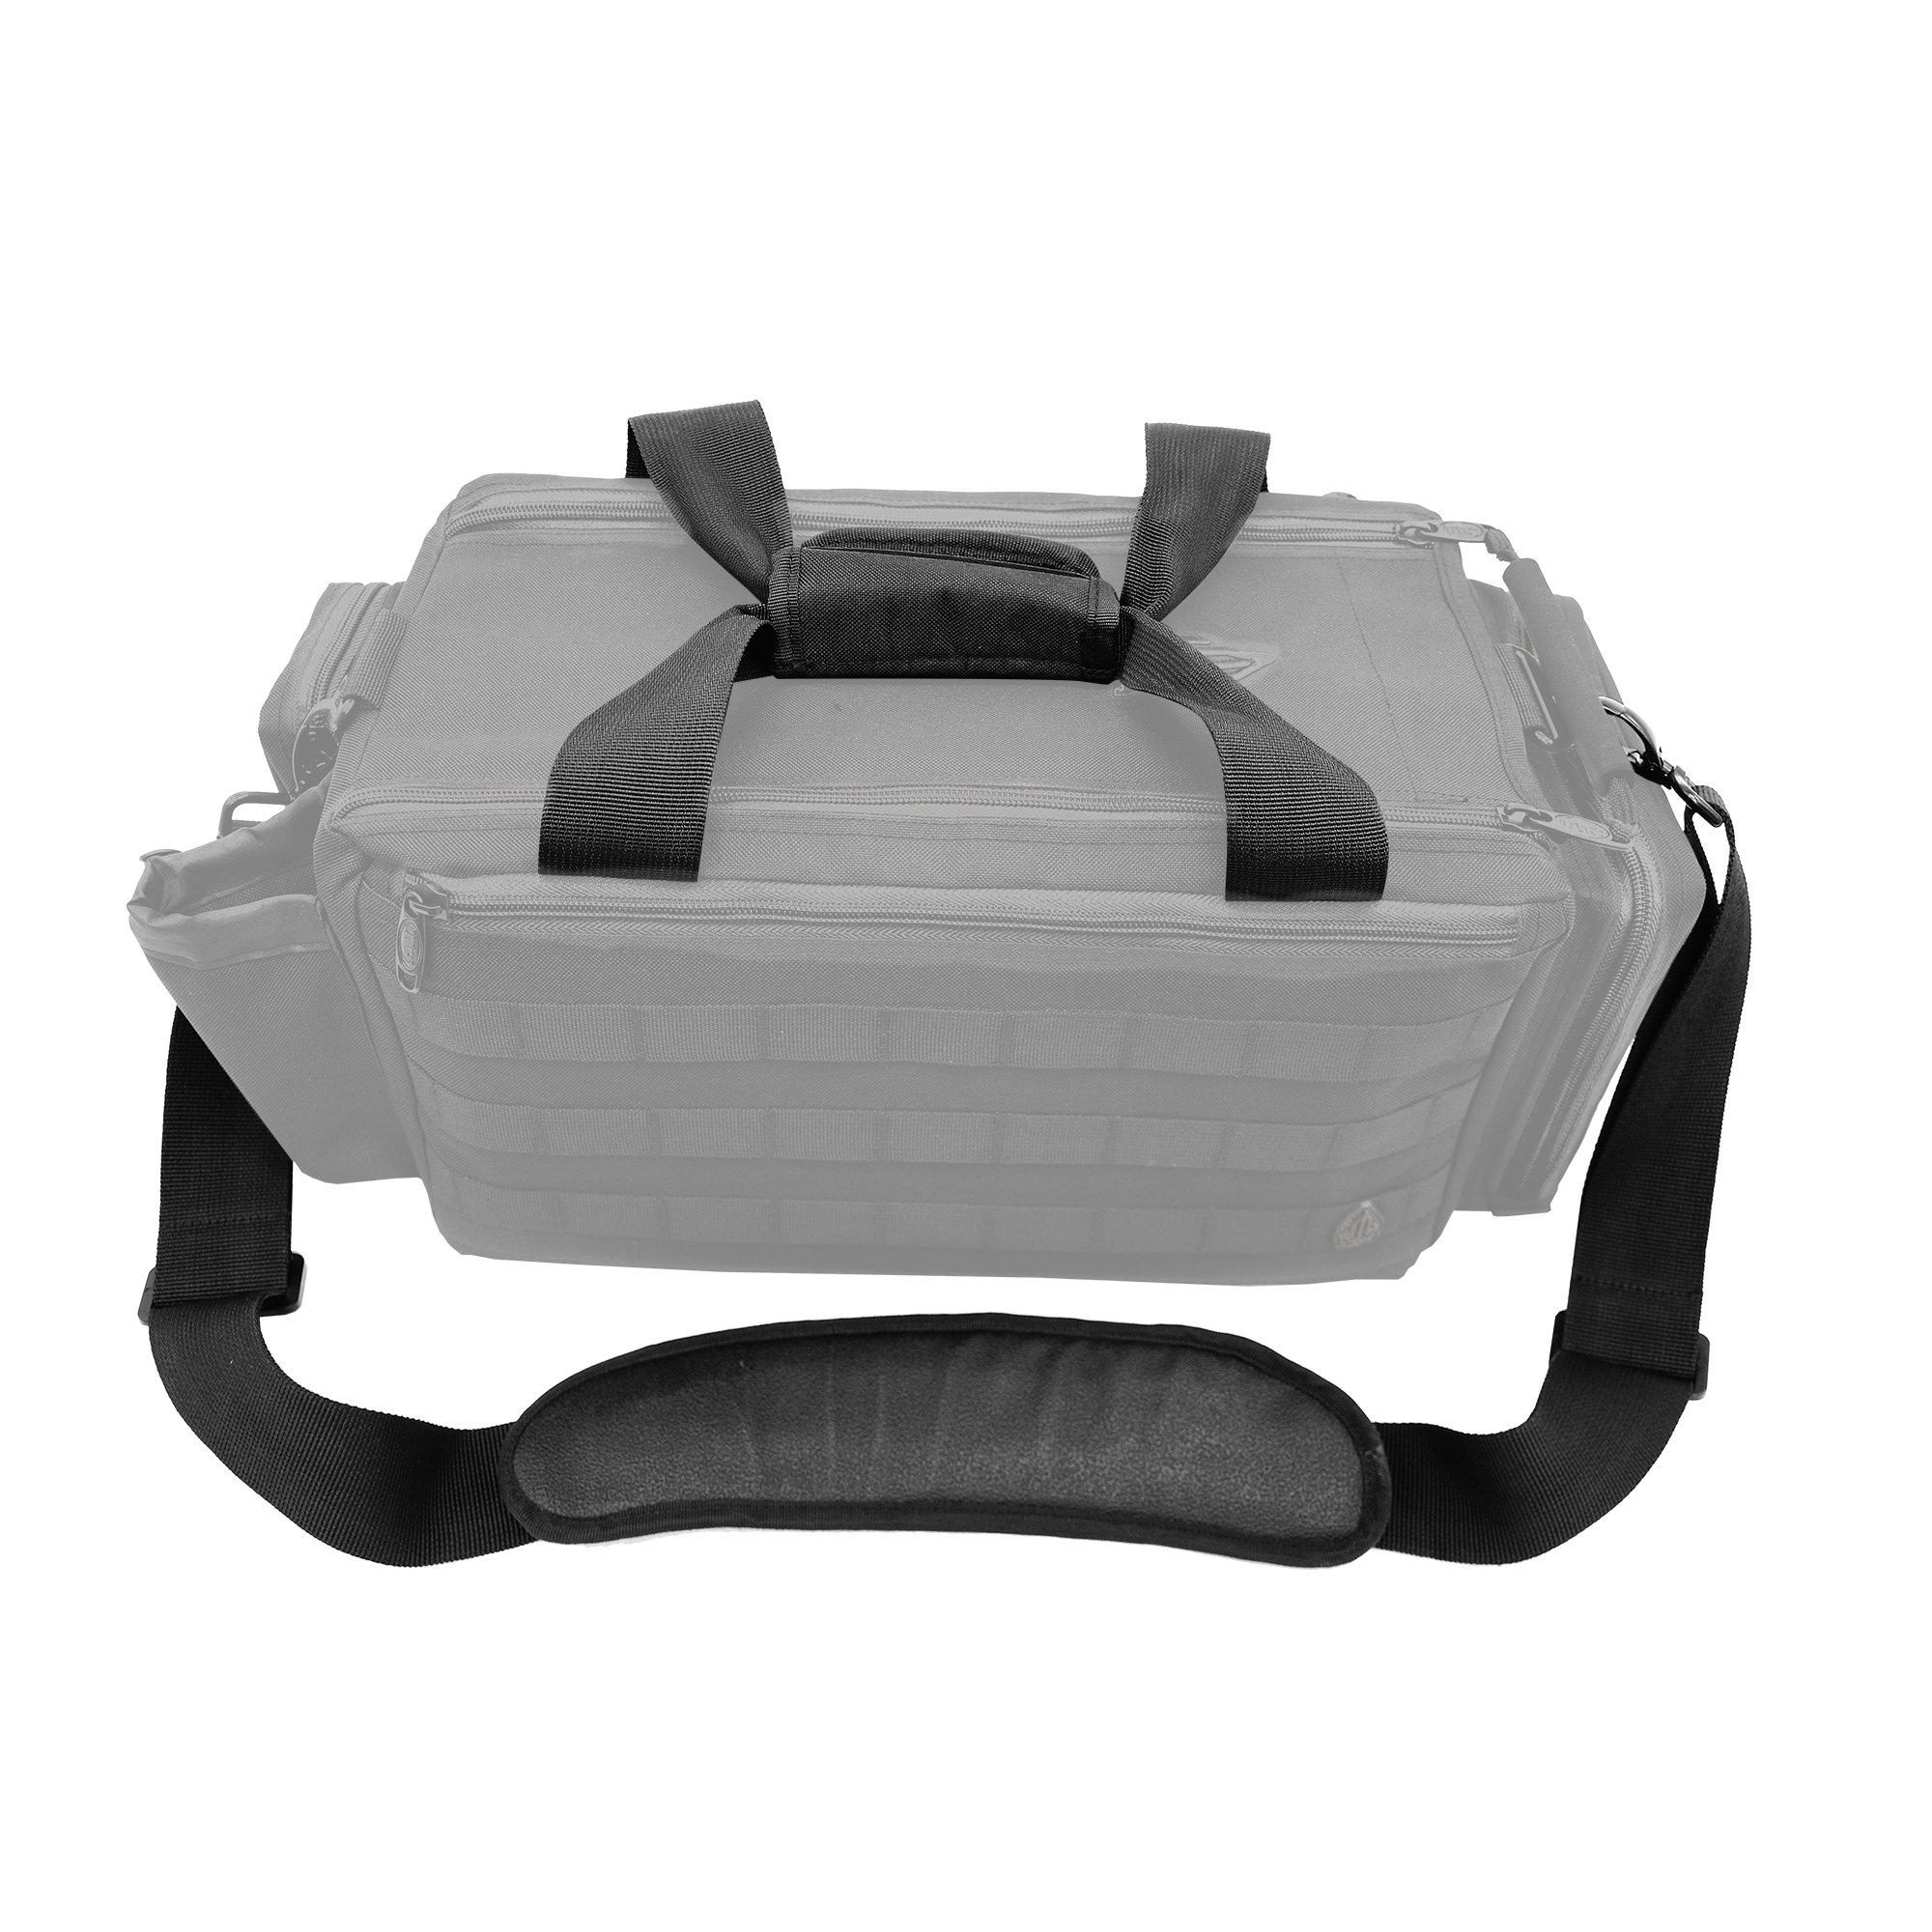 UTG All in One Range/Utility Go Bag, Black, 21'' x 10'' x 9'' by UTG (Image #12)